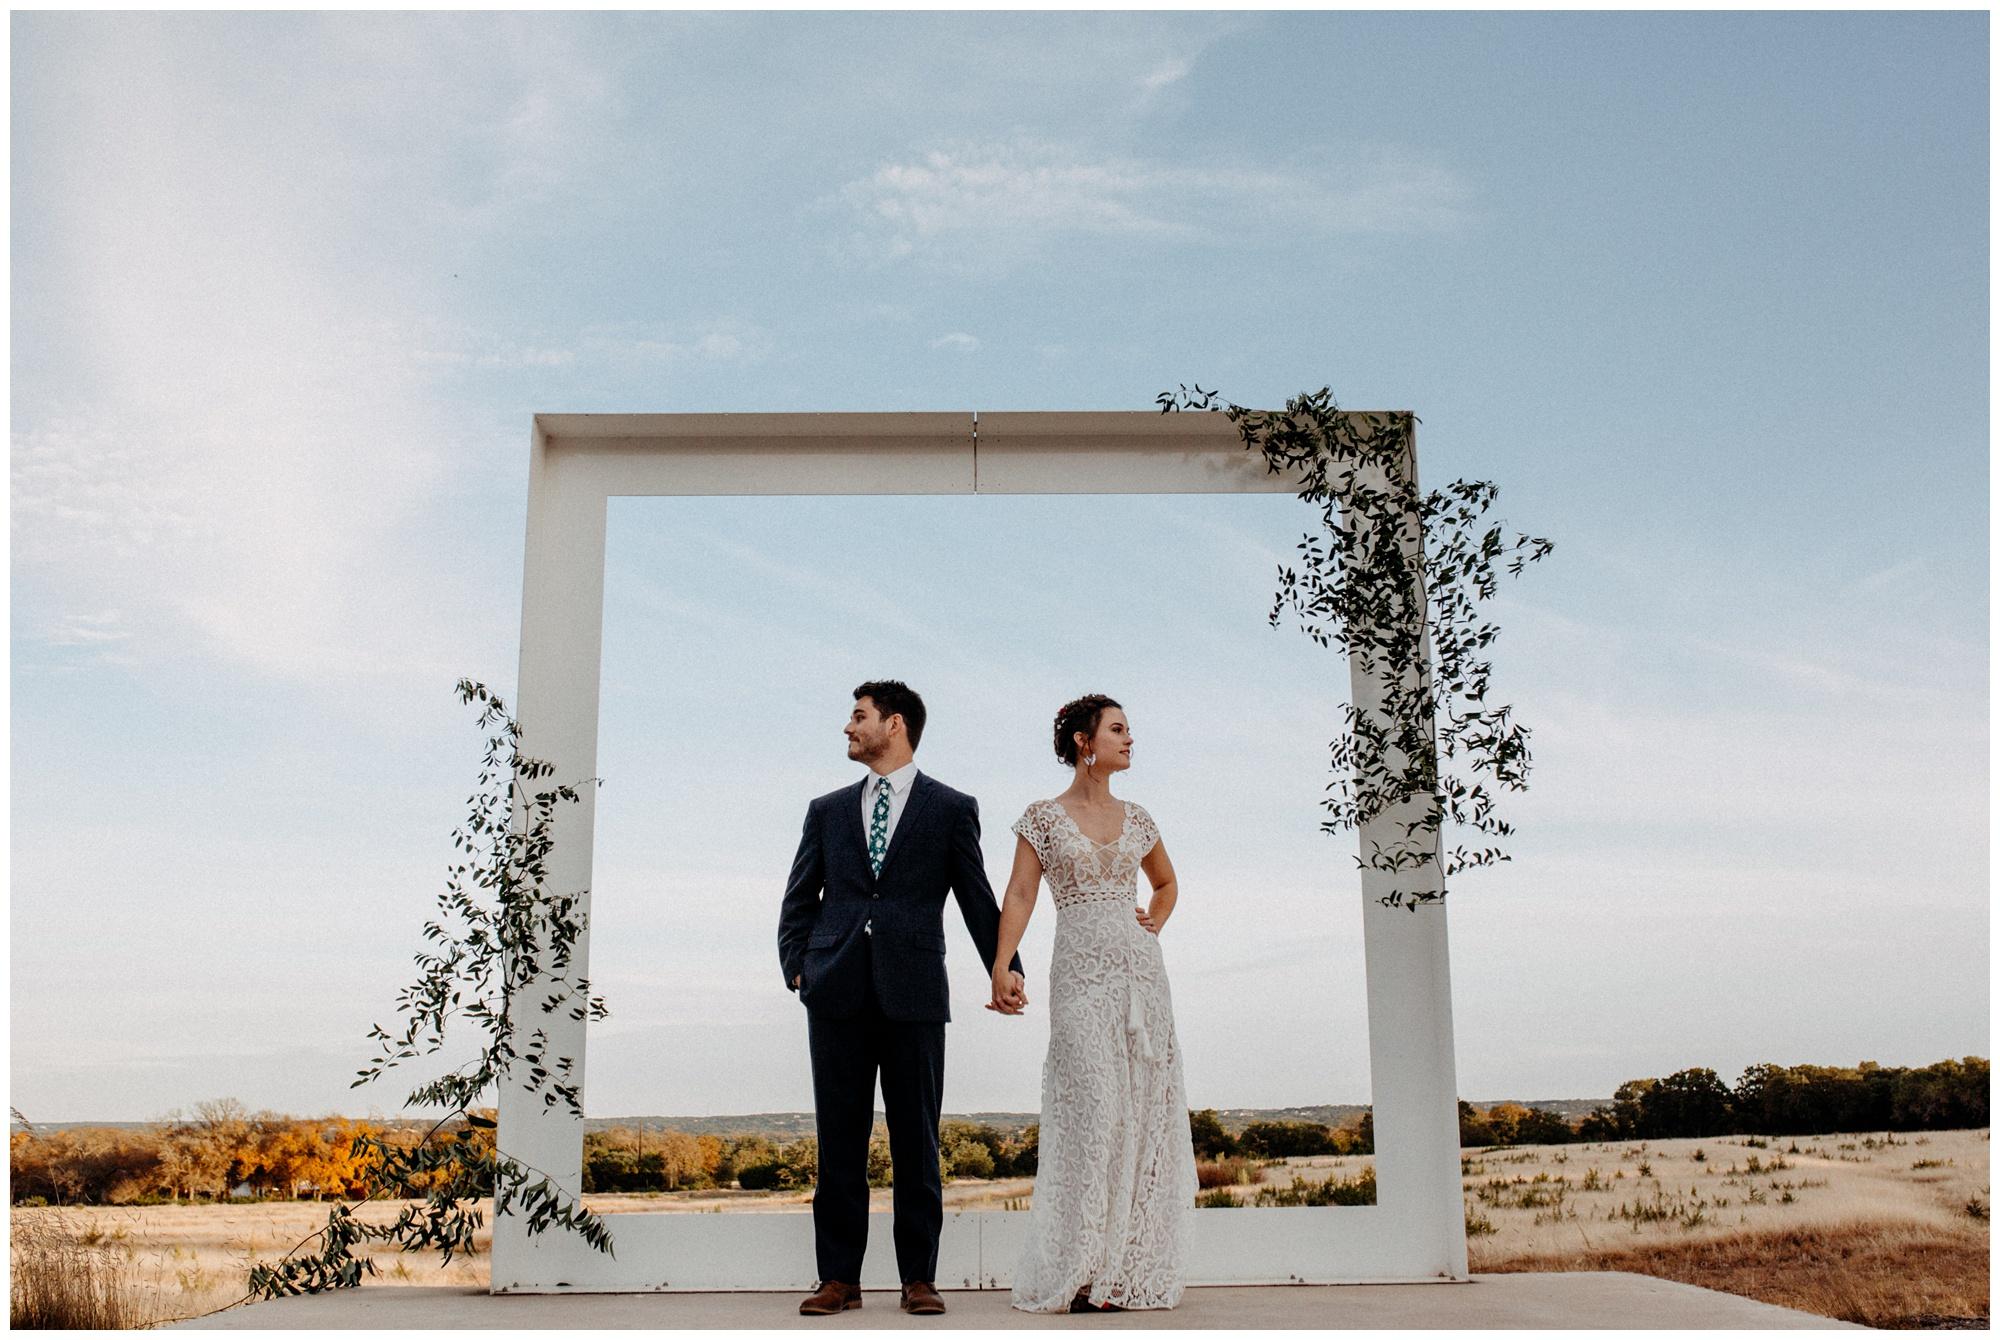 AUSTIN-TEXAS-PROSPECT-HOUSE-WEDDING-VENUE-PHOTOGRAPHY25828.JPG